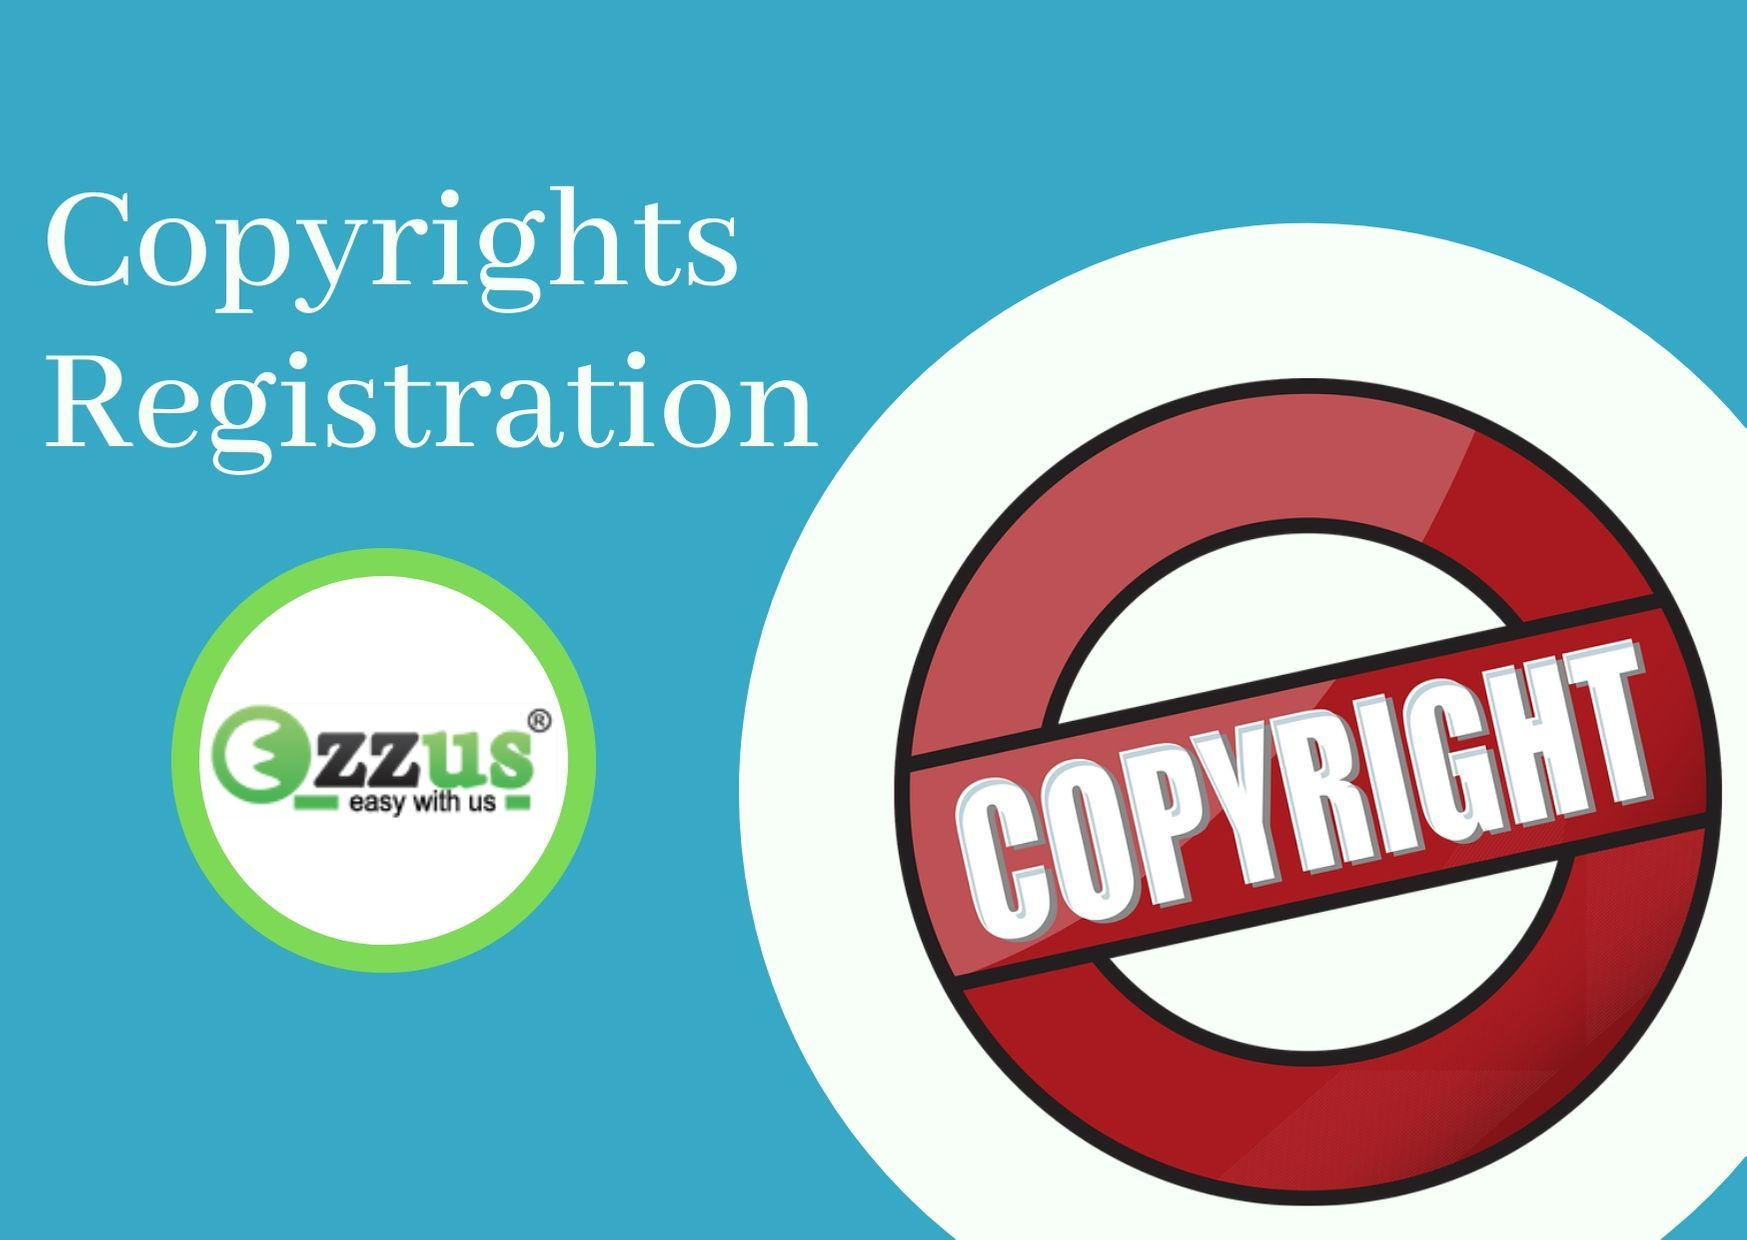 Copyright Registration Registration, How to apply, Copyright